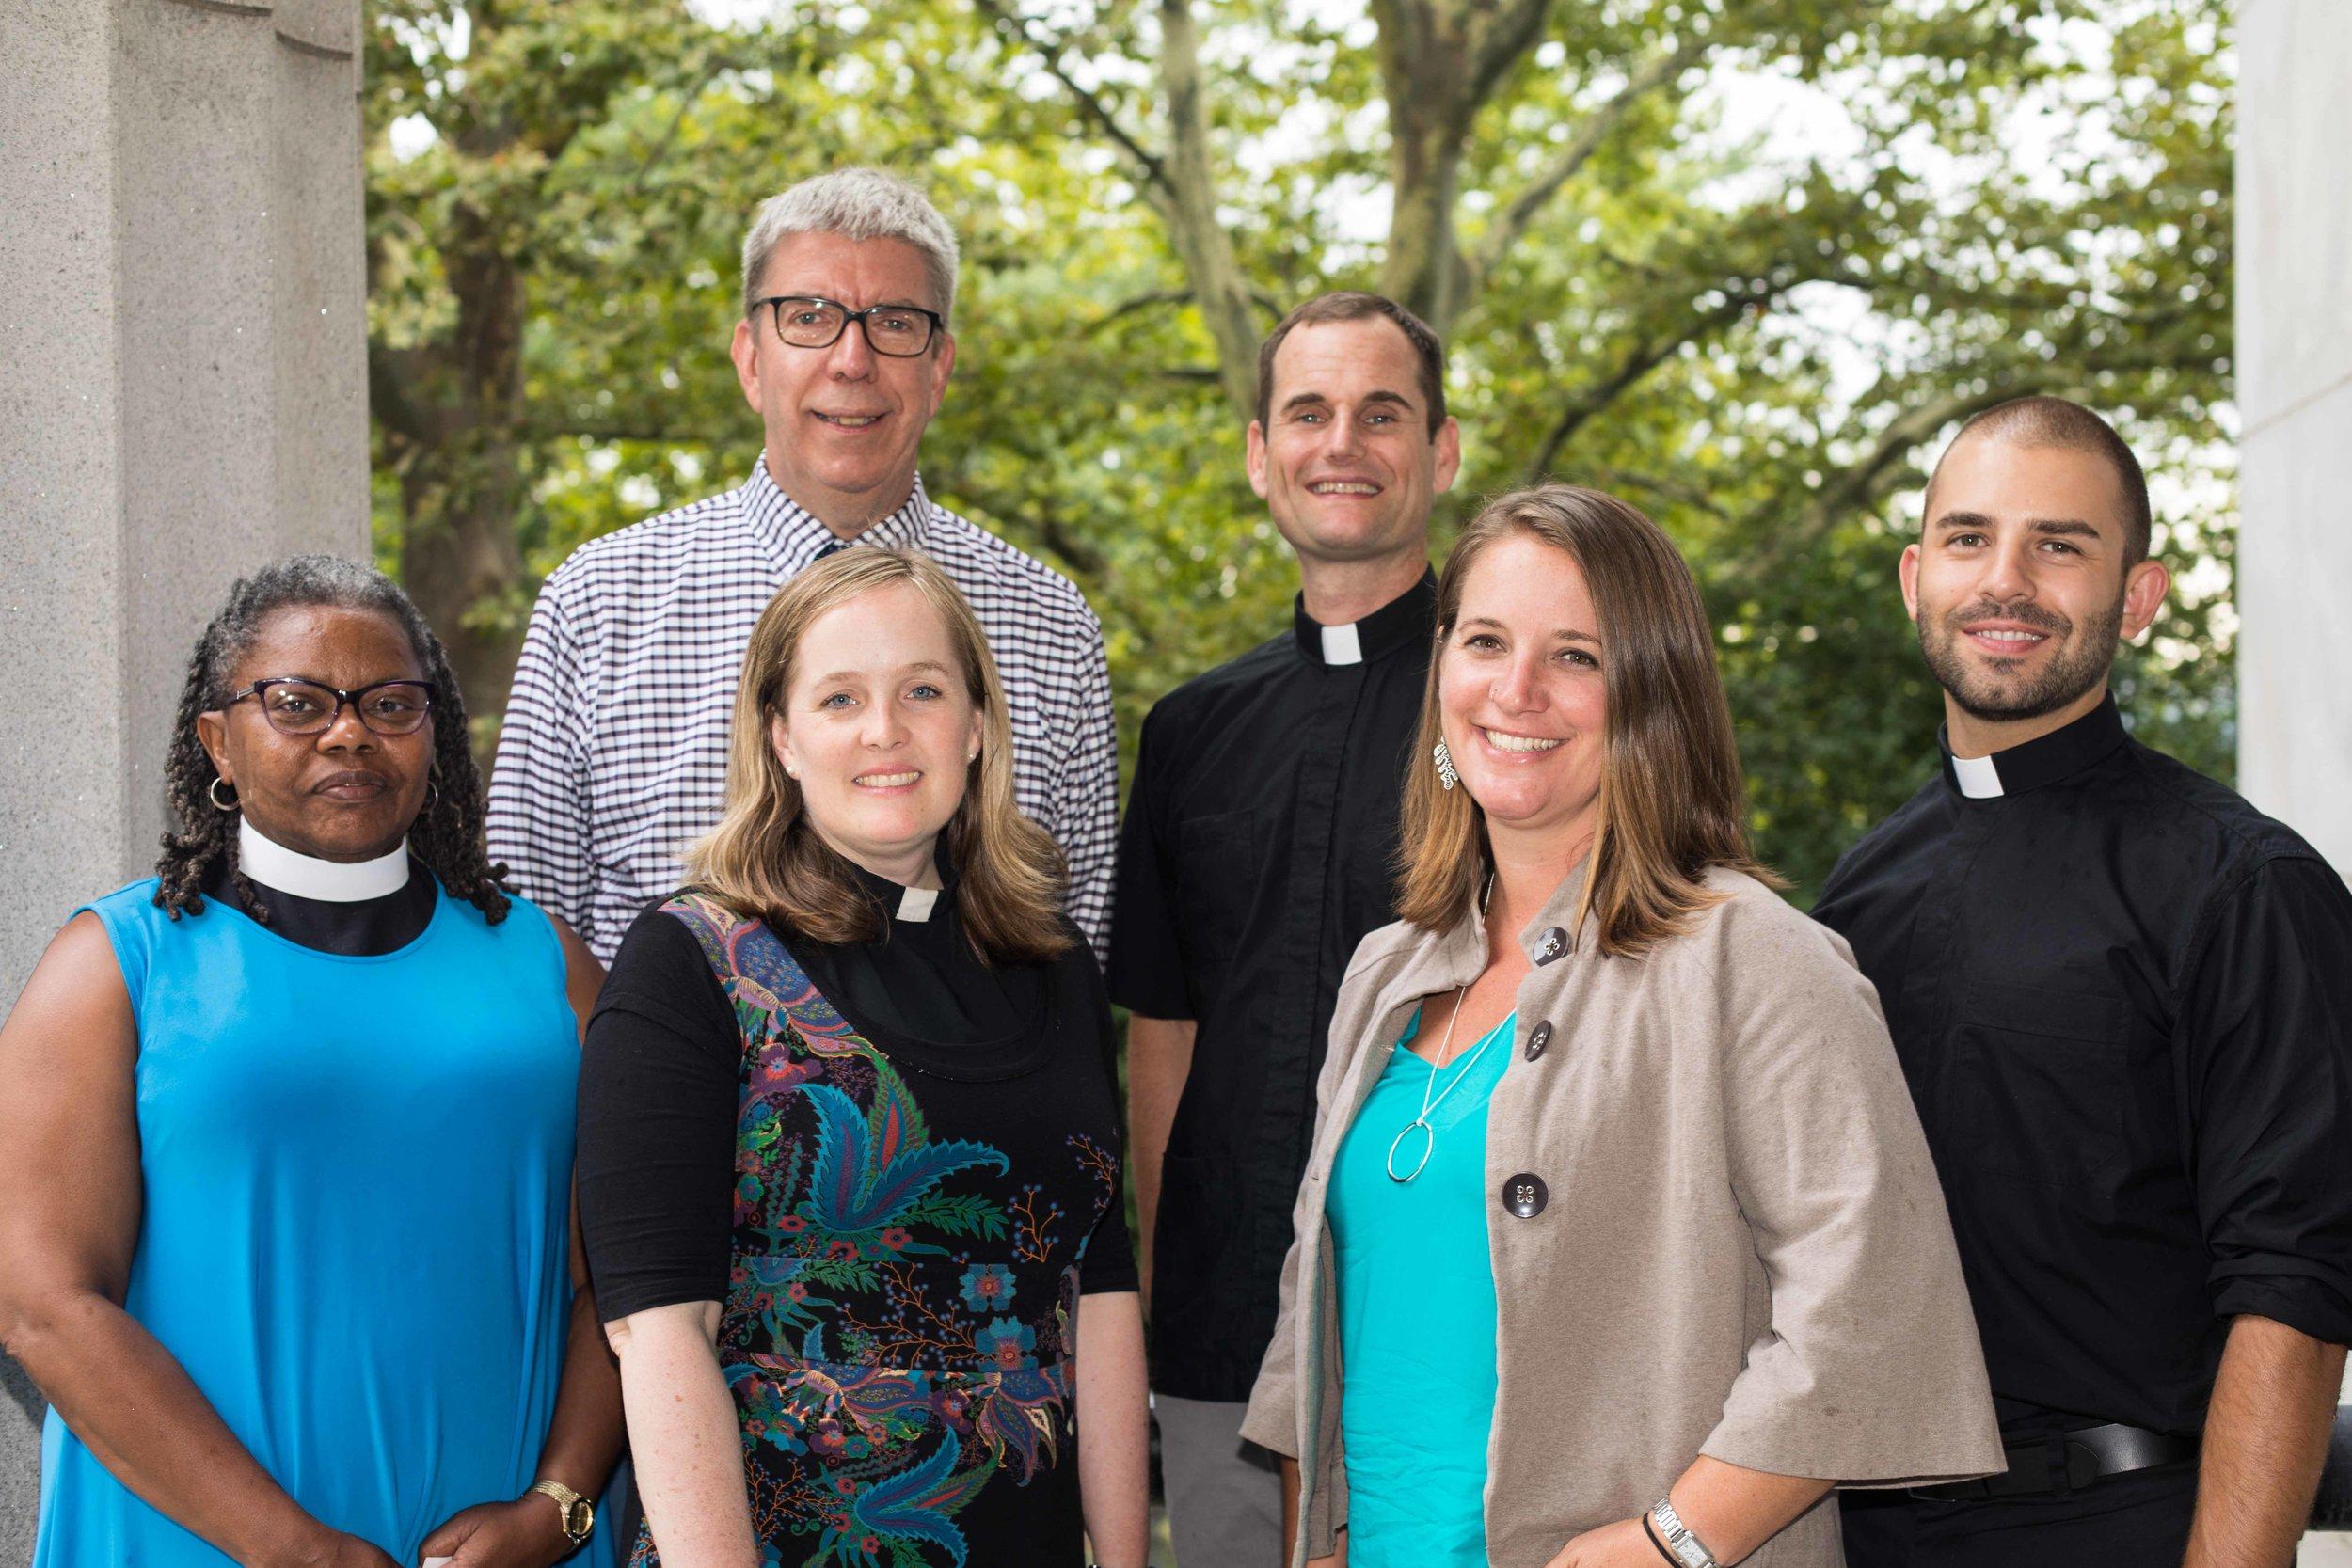 2017-2018 Episcopal Church Foundation fellows (photo credit: Episcopal Church Foundation)